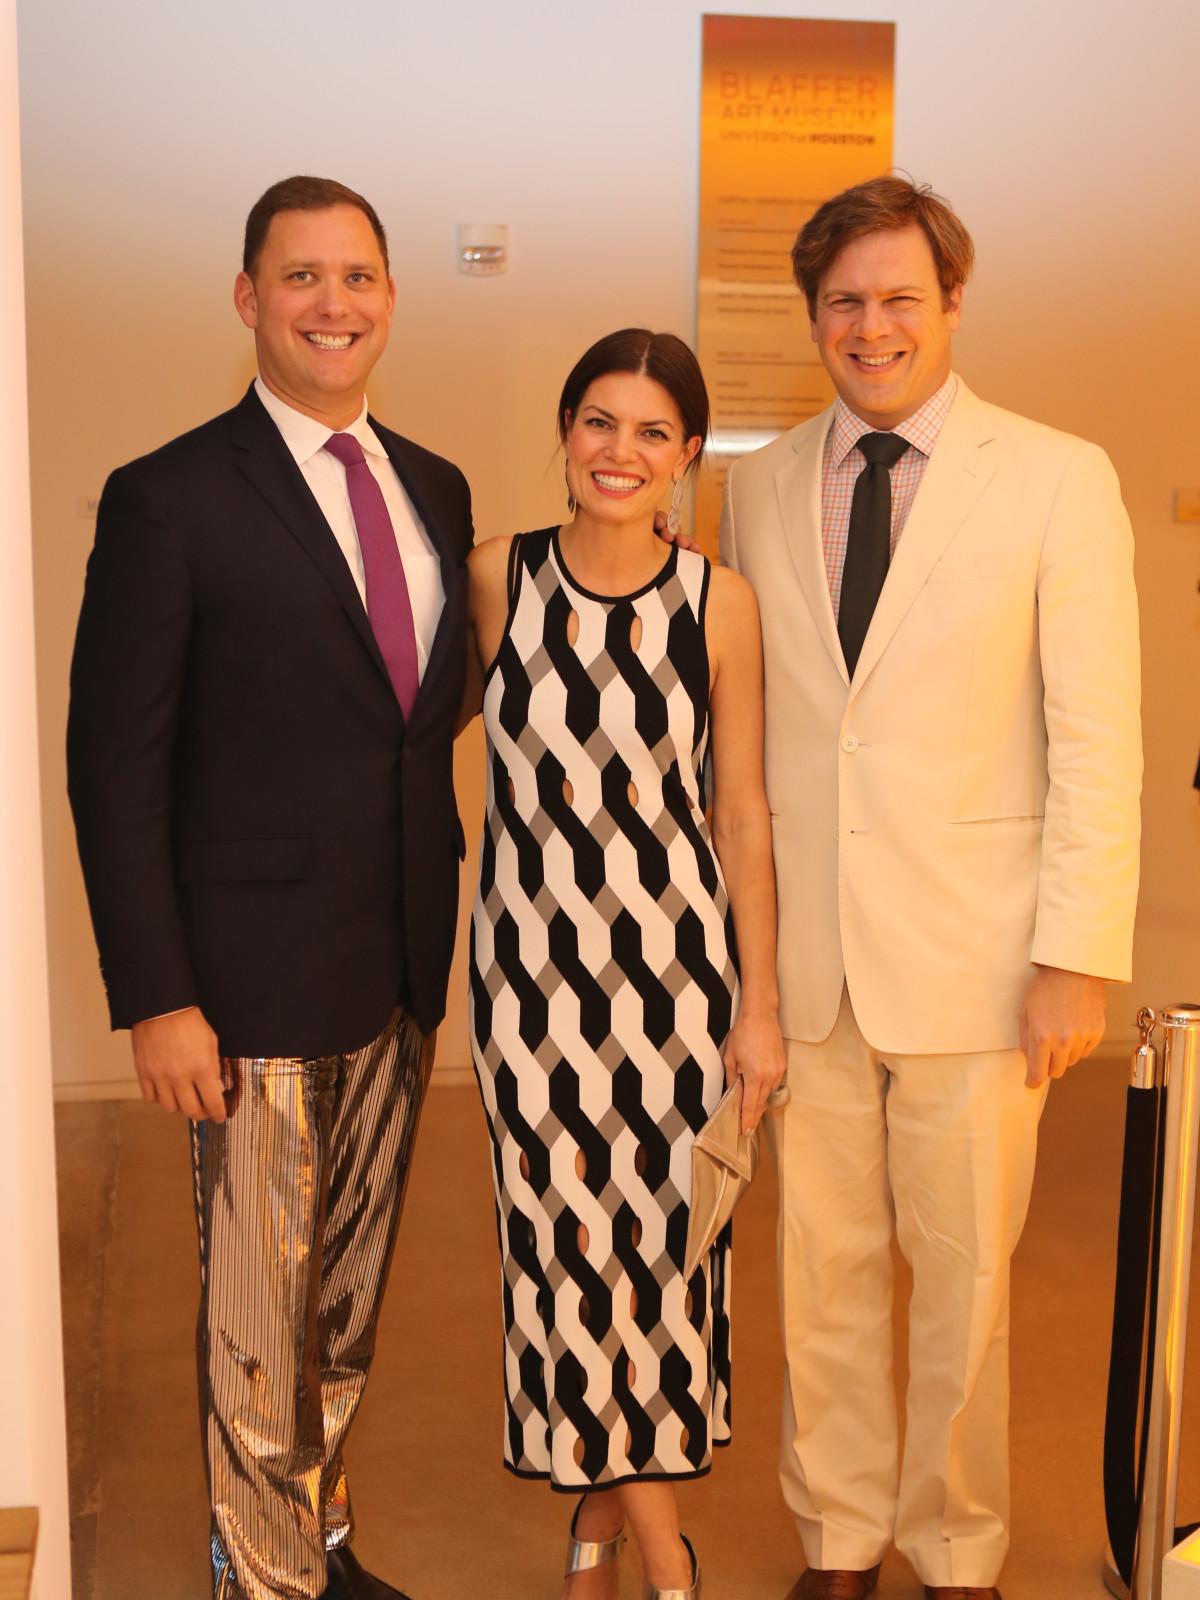 Blaffer Galleria Gala, April 2016, Ryan Gordon, Ashley Putnam, Steve Putnam